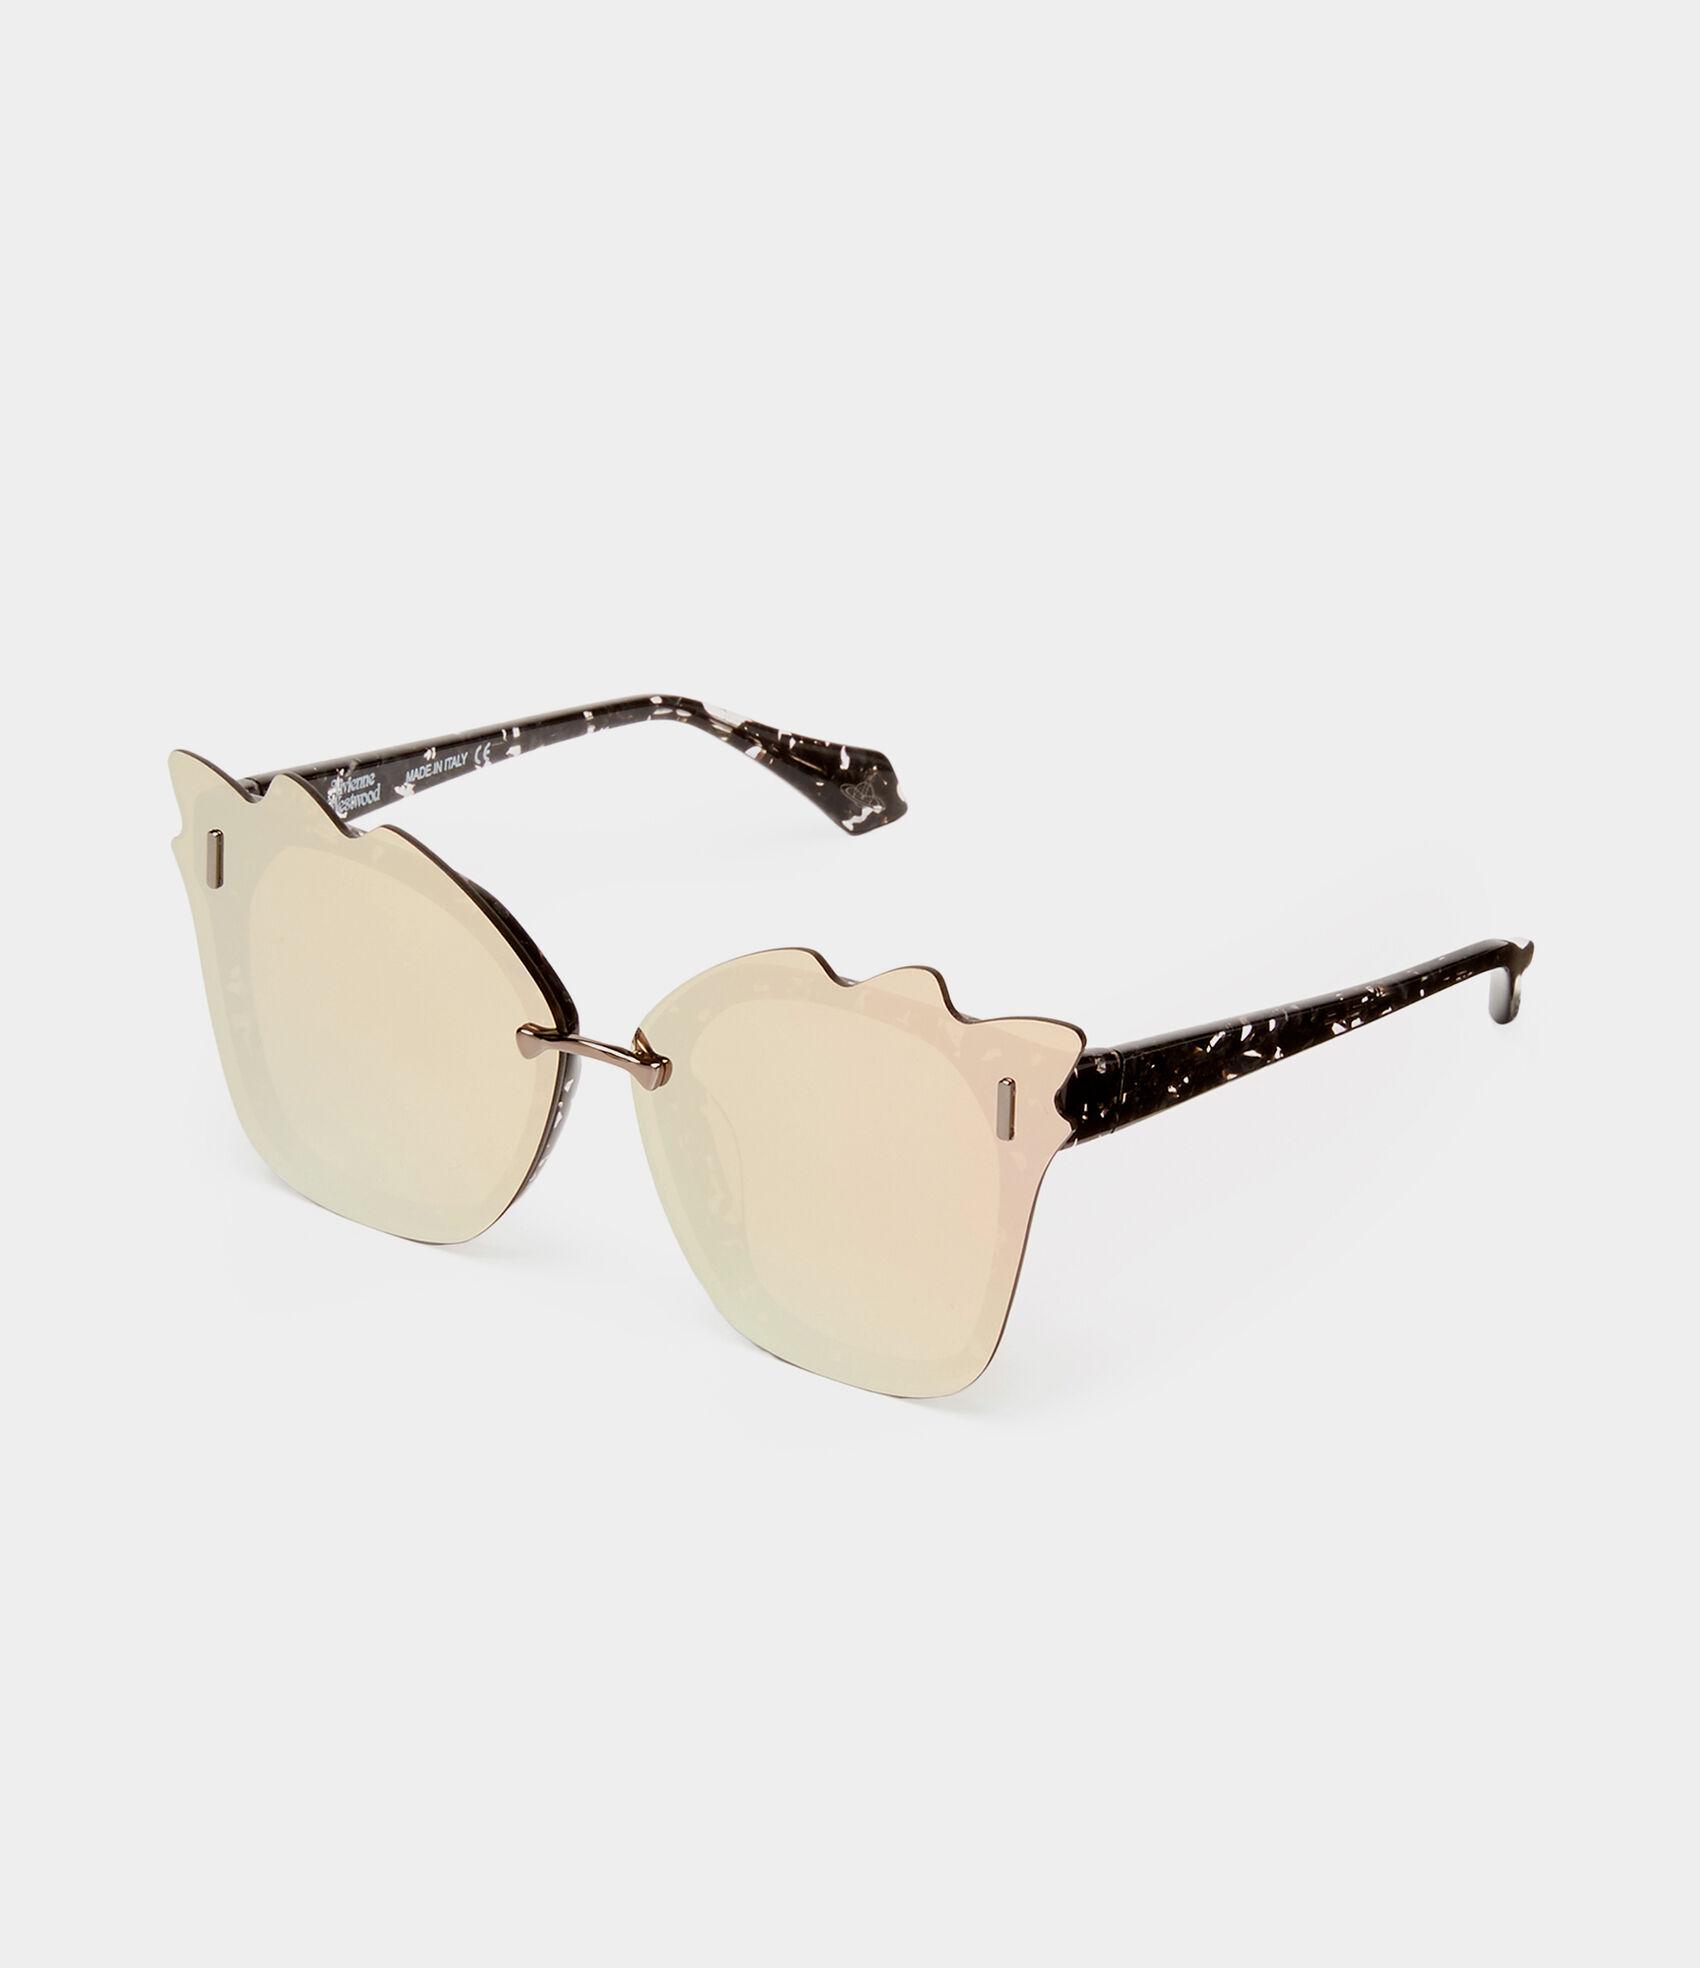 c5beb69cea00 Vivienne Westwood Women s Designer Sunglasses